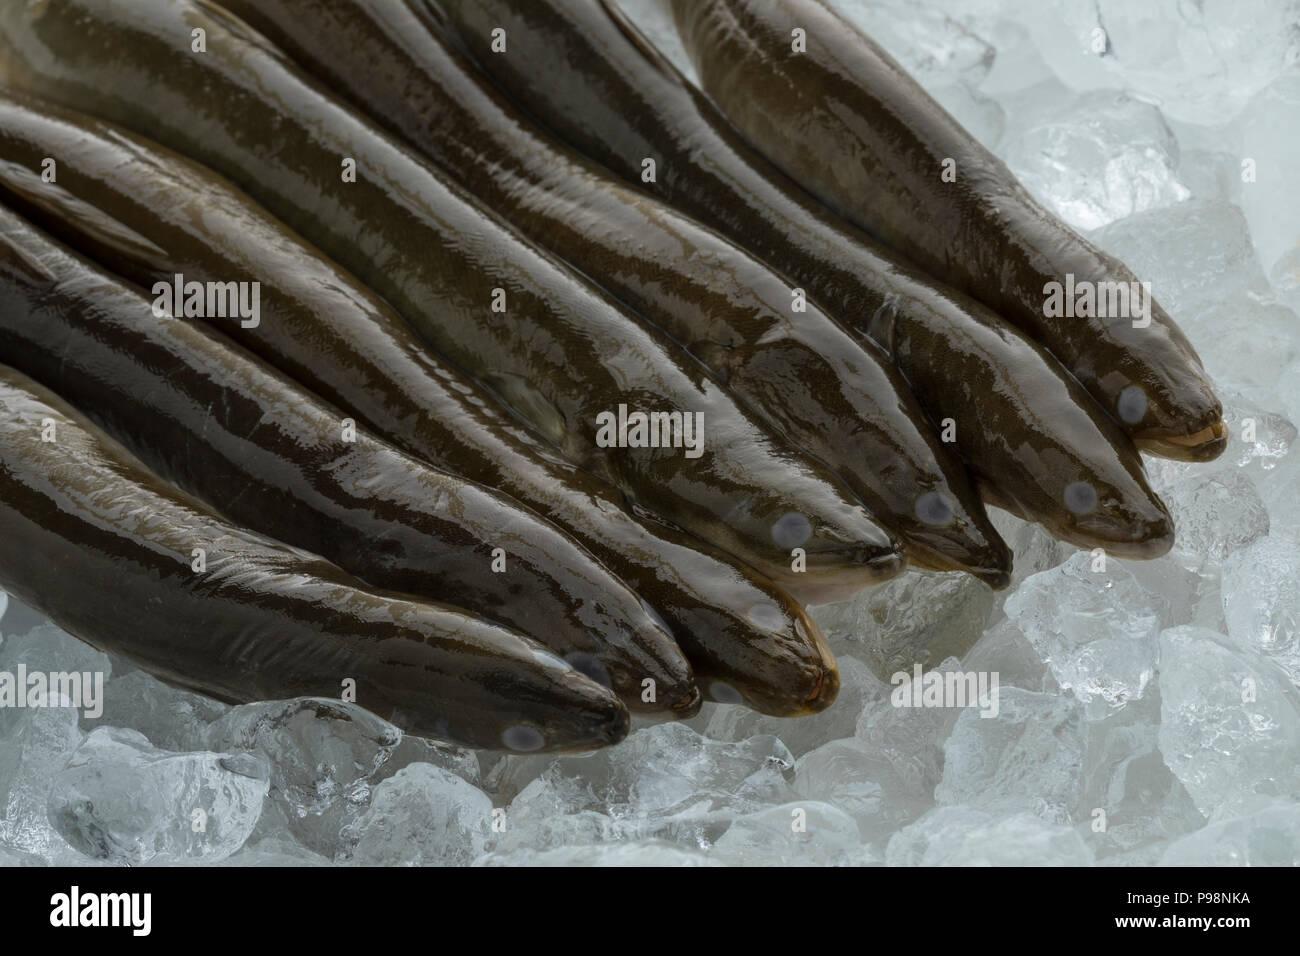 Fresh raw mature European eels on ice Stock Photo